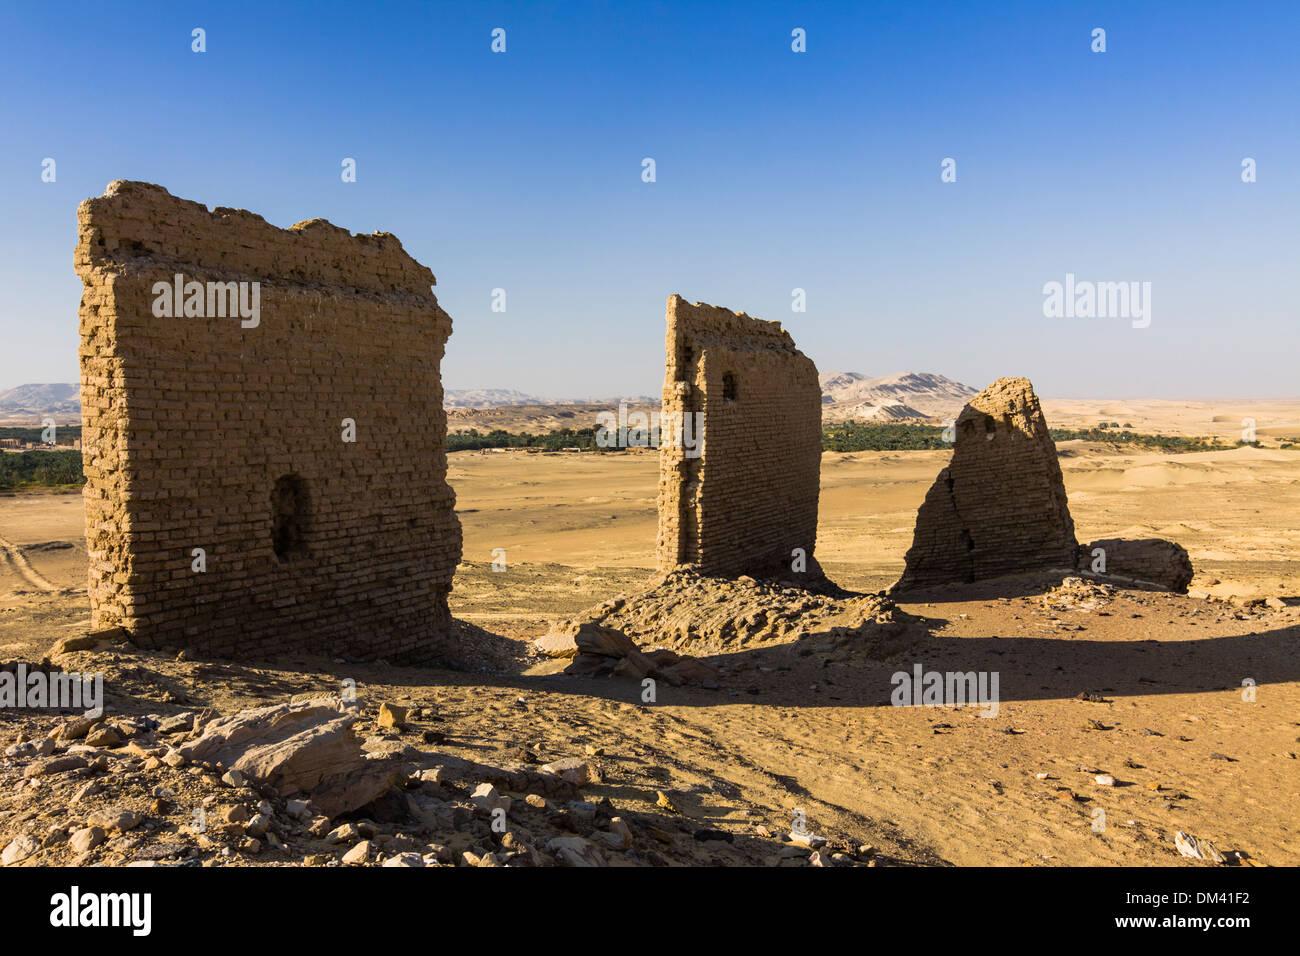 Ruins of the temple and fortress of An-Nadura at Al-Kharga, Egypt Stock Photo